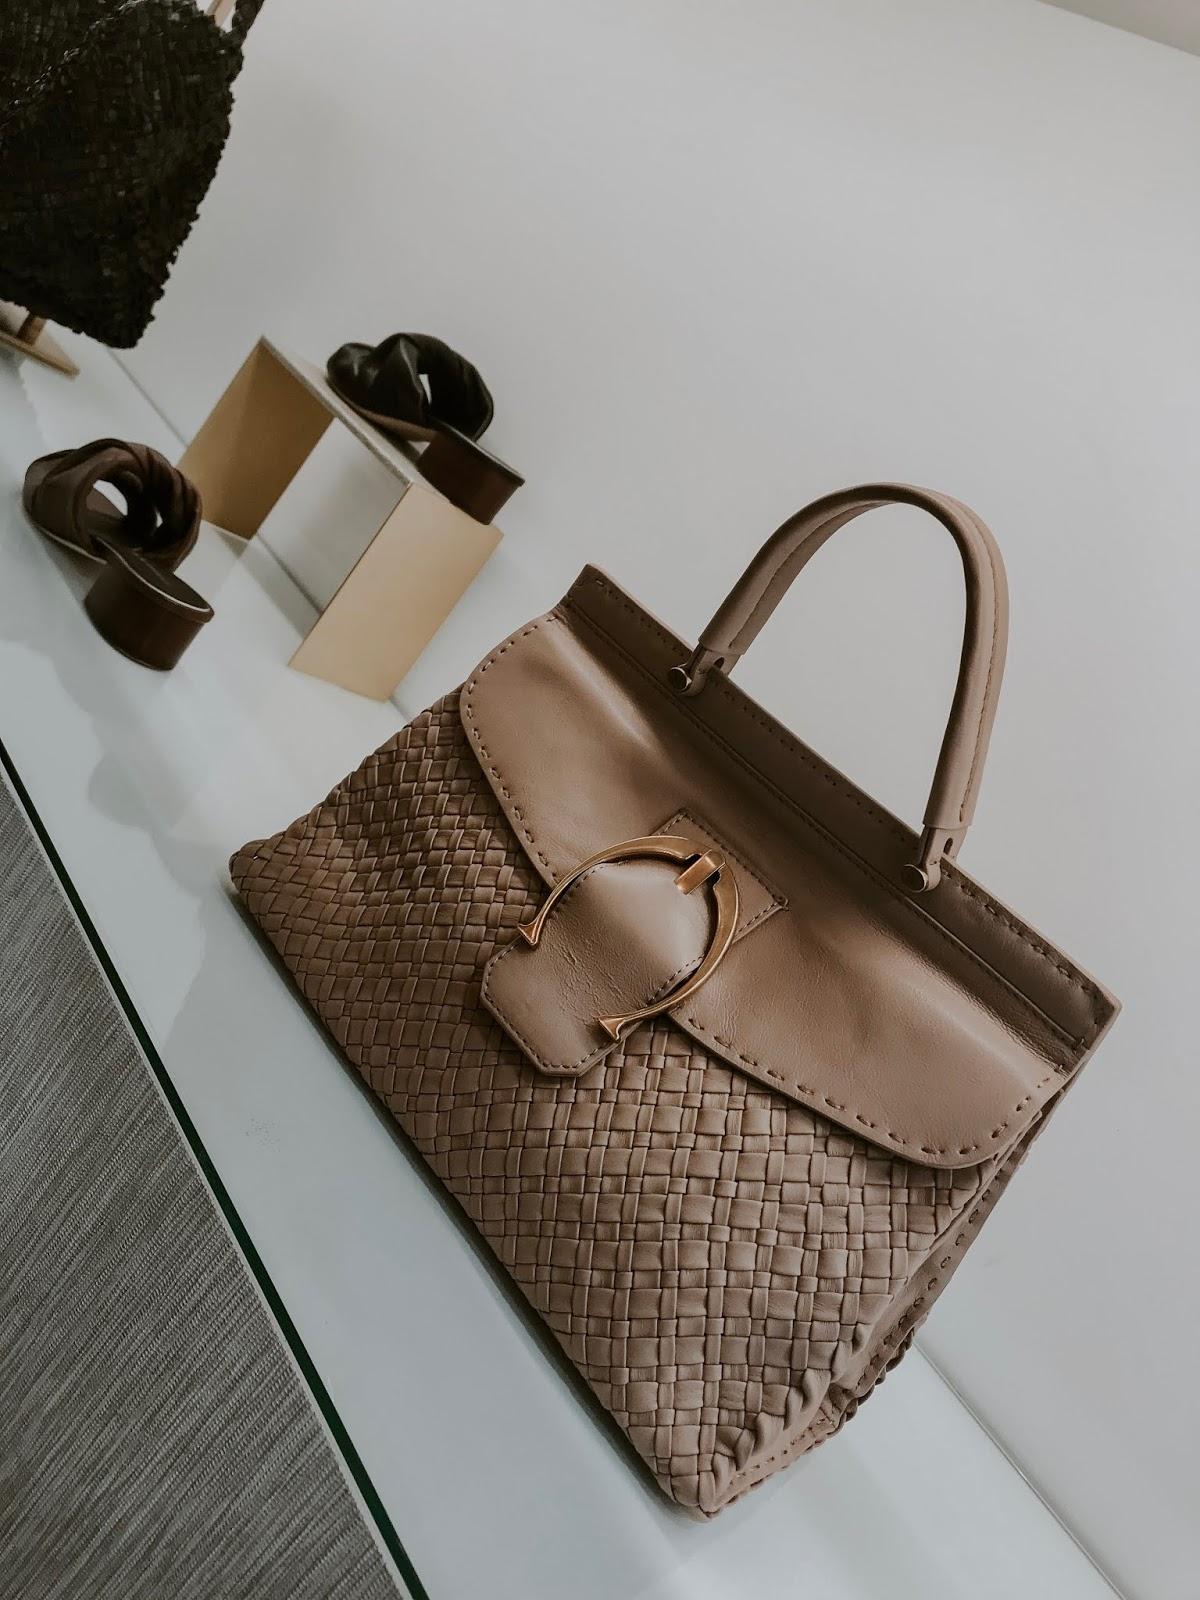 Etienne Aigner Handbag